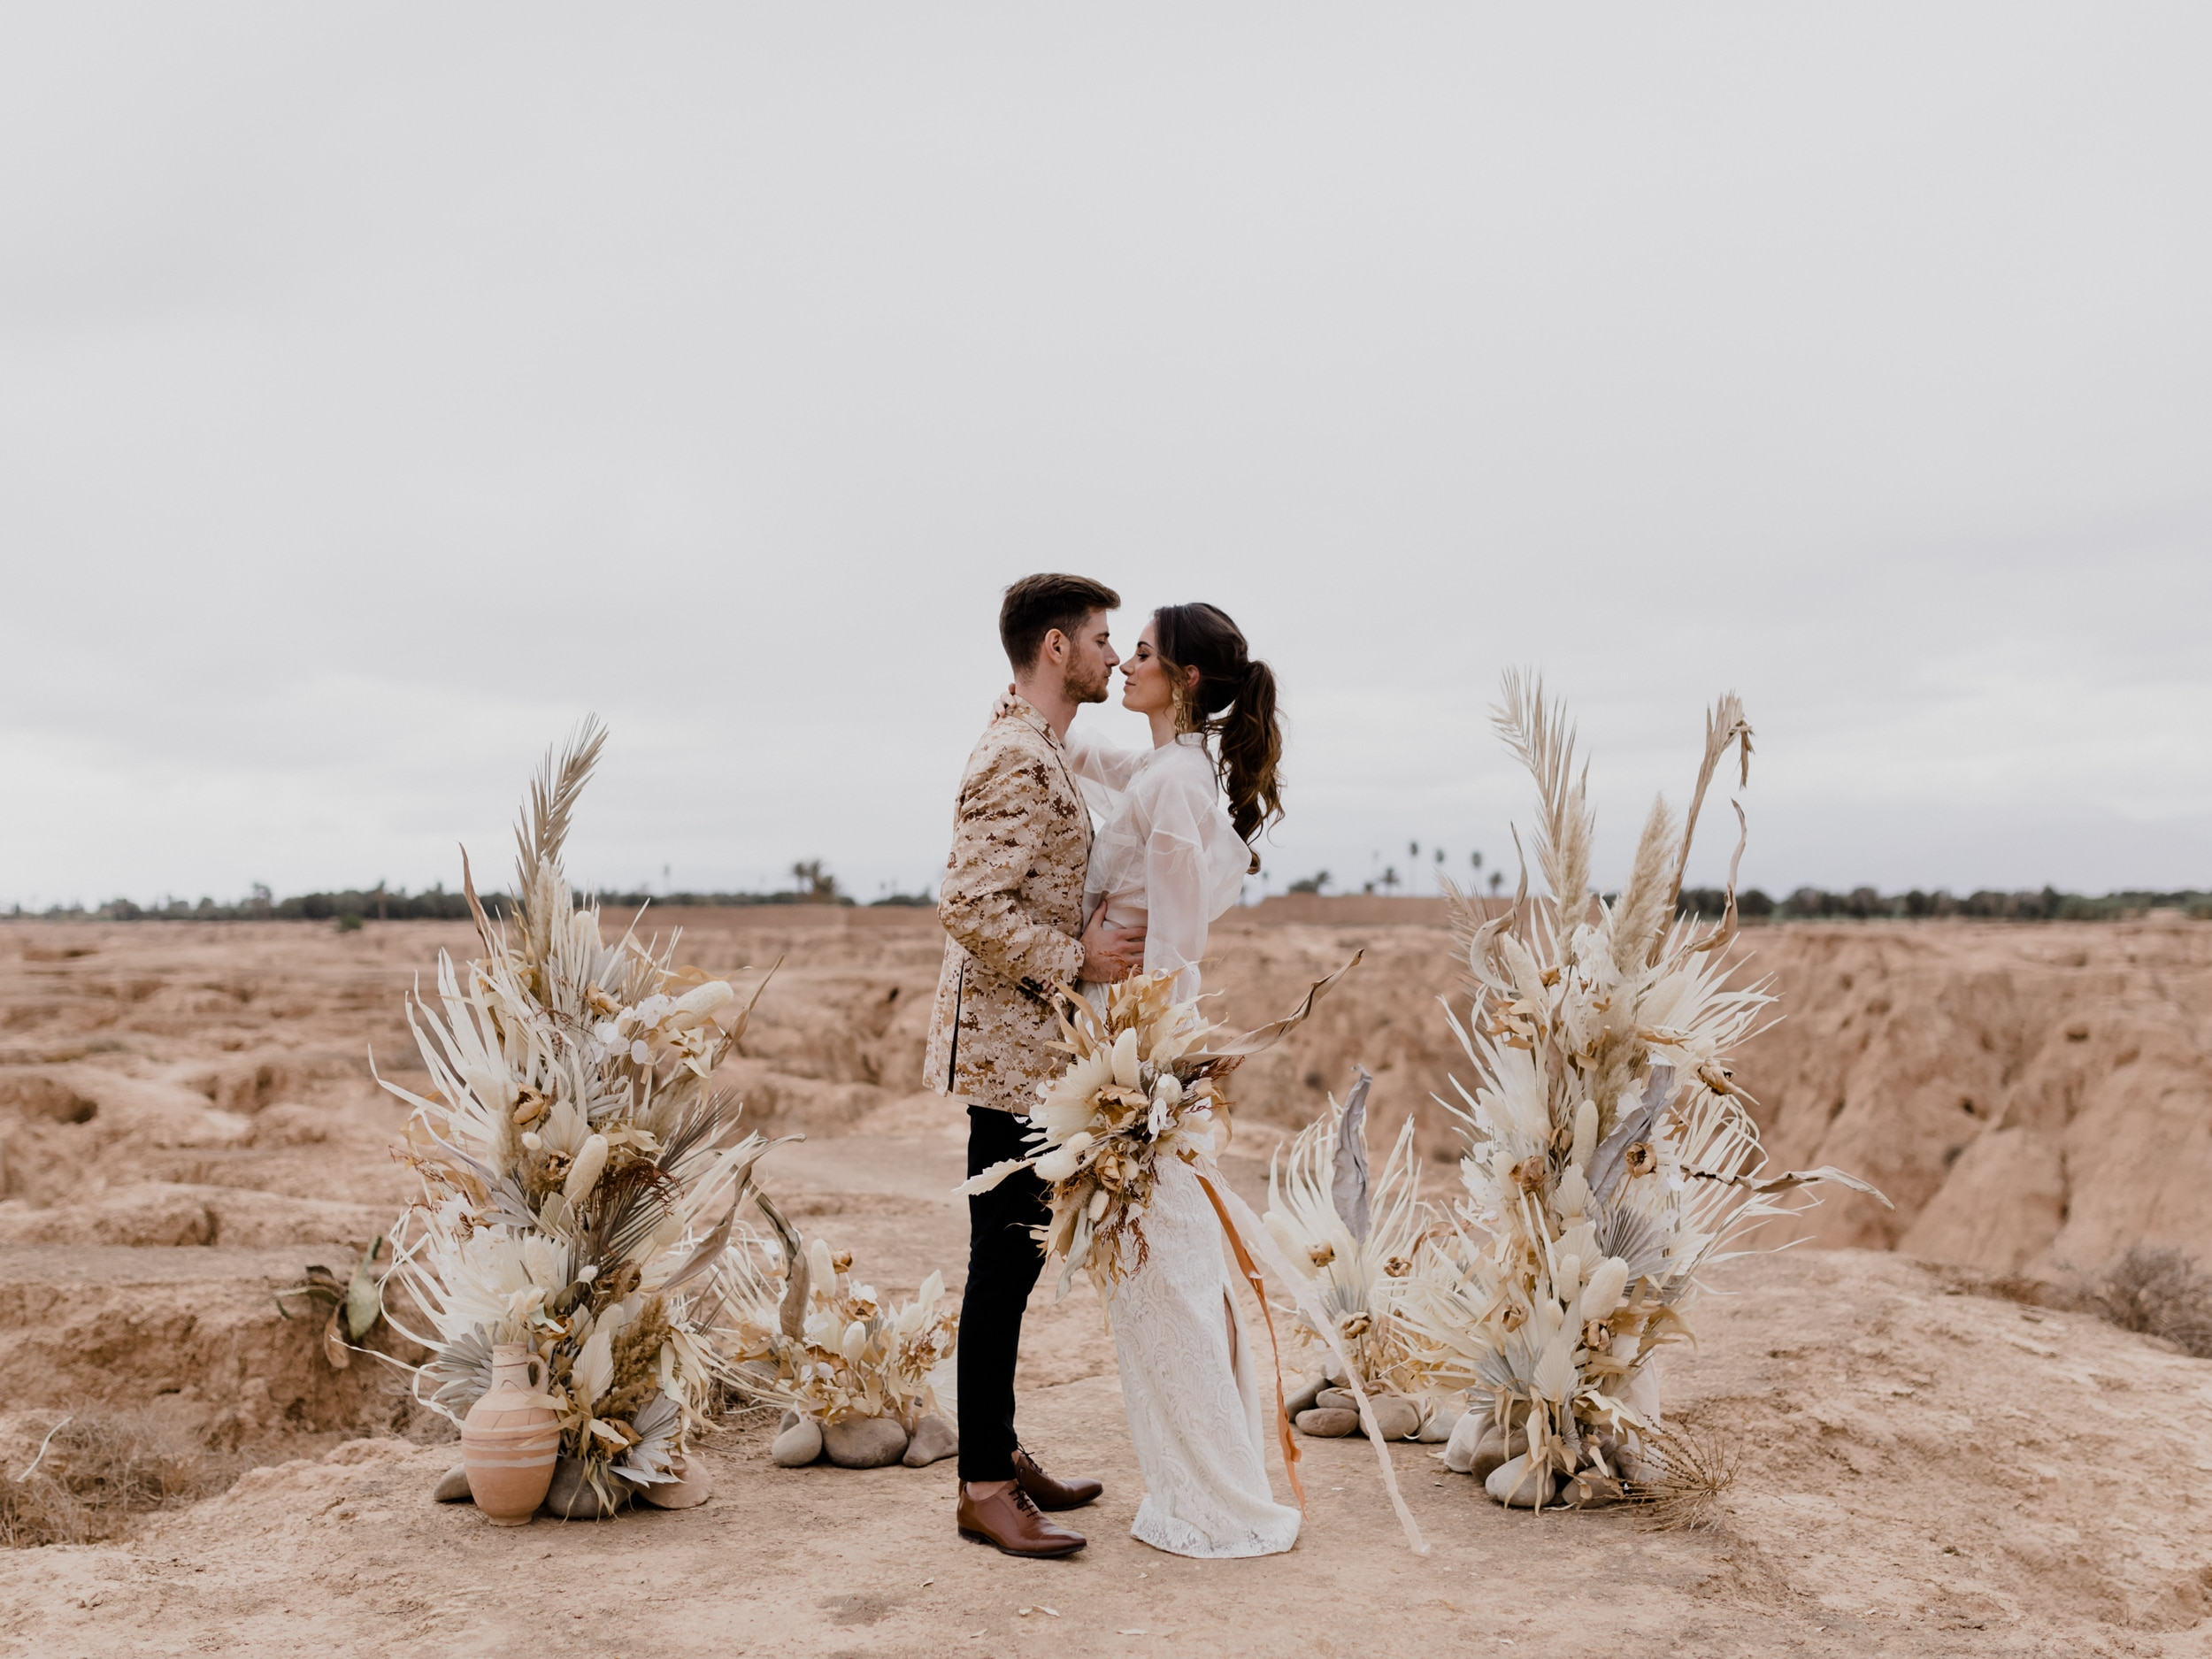 photographe-mariage-normandie-simon-davodet-3